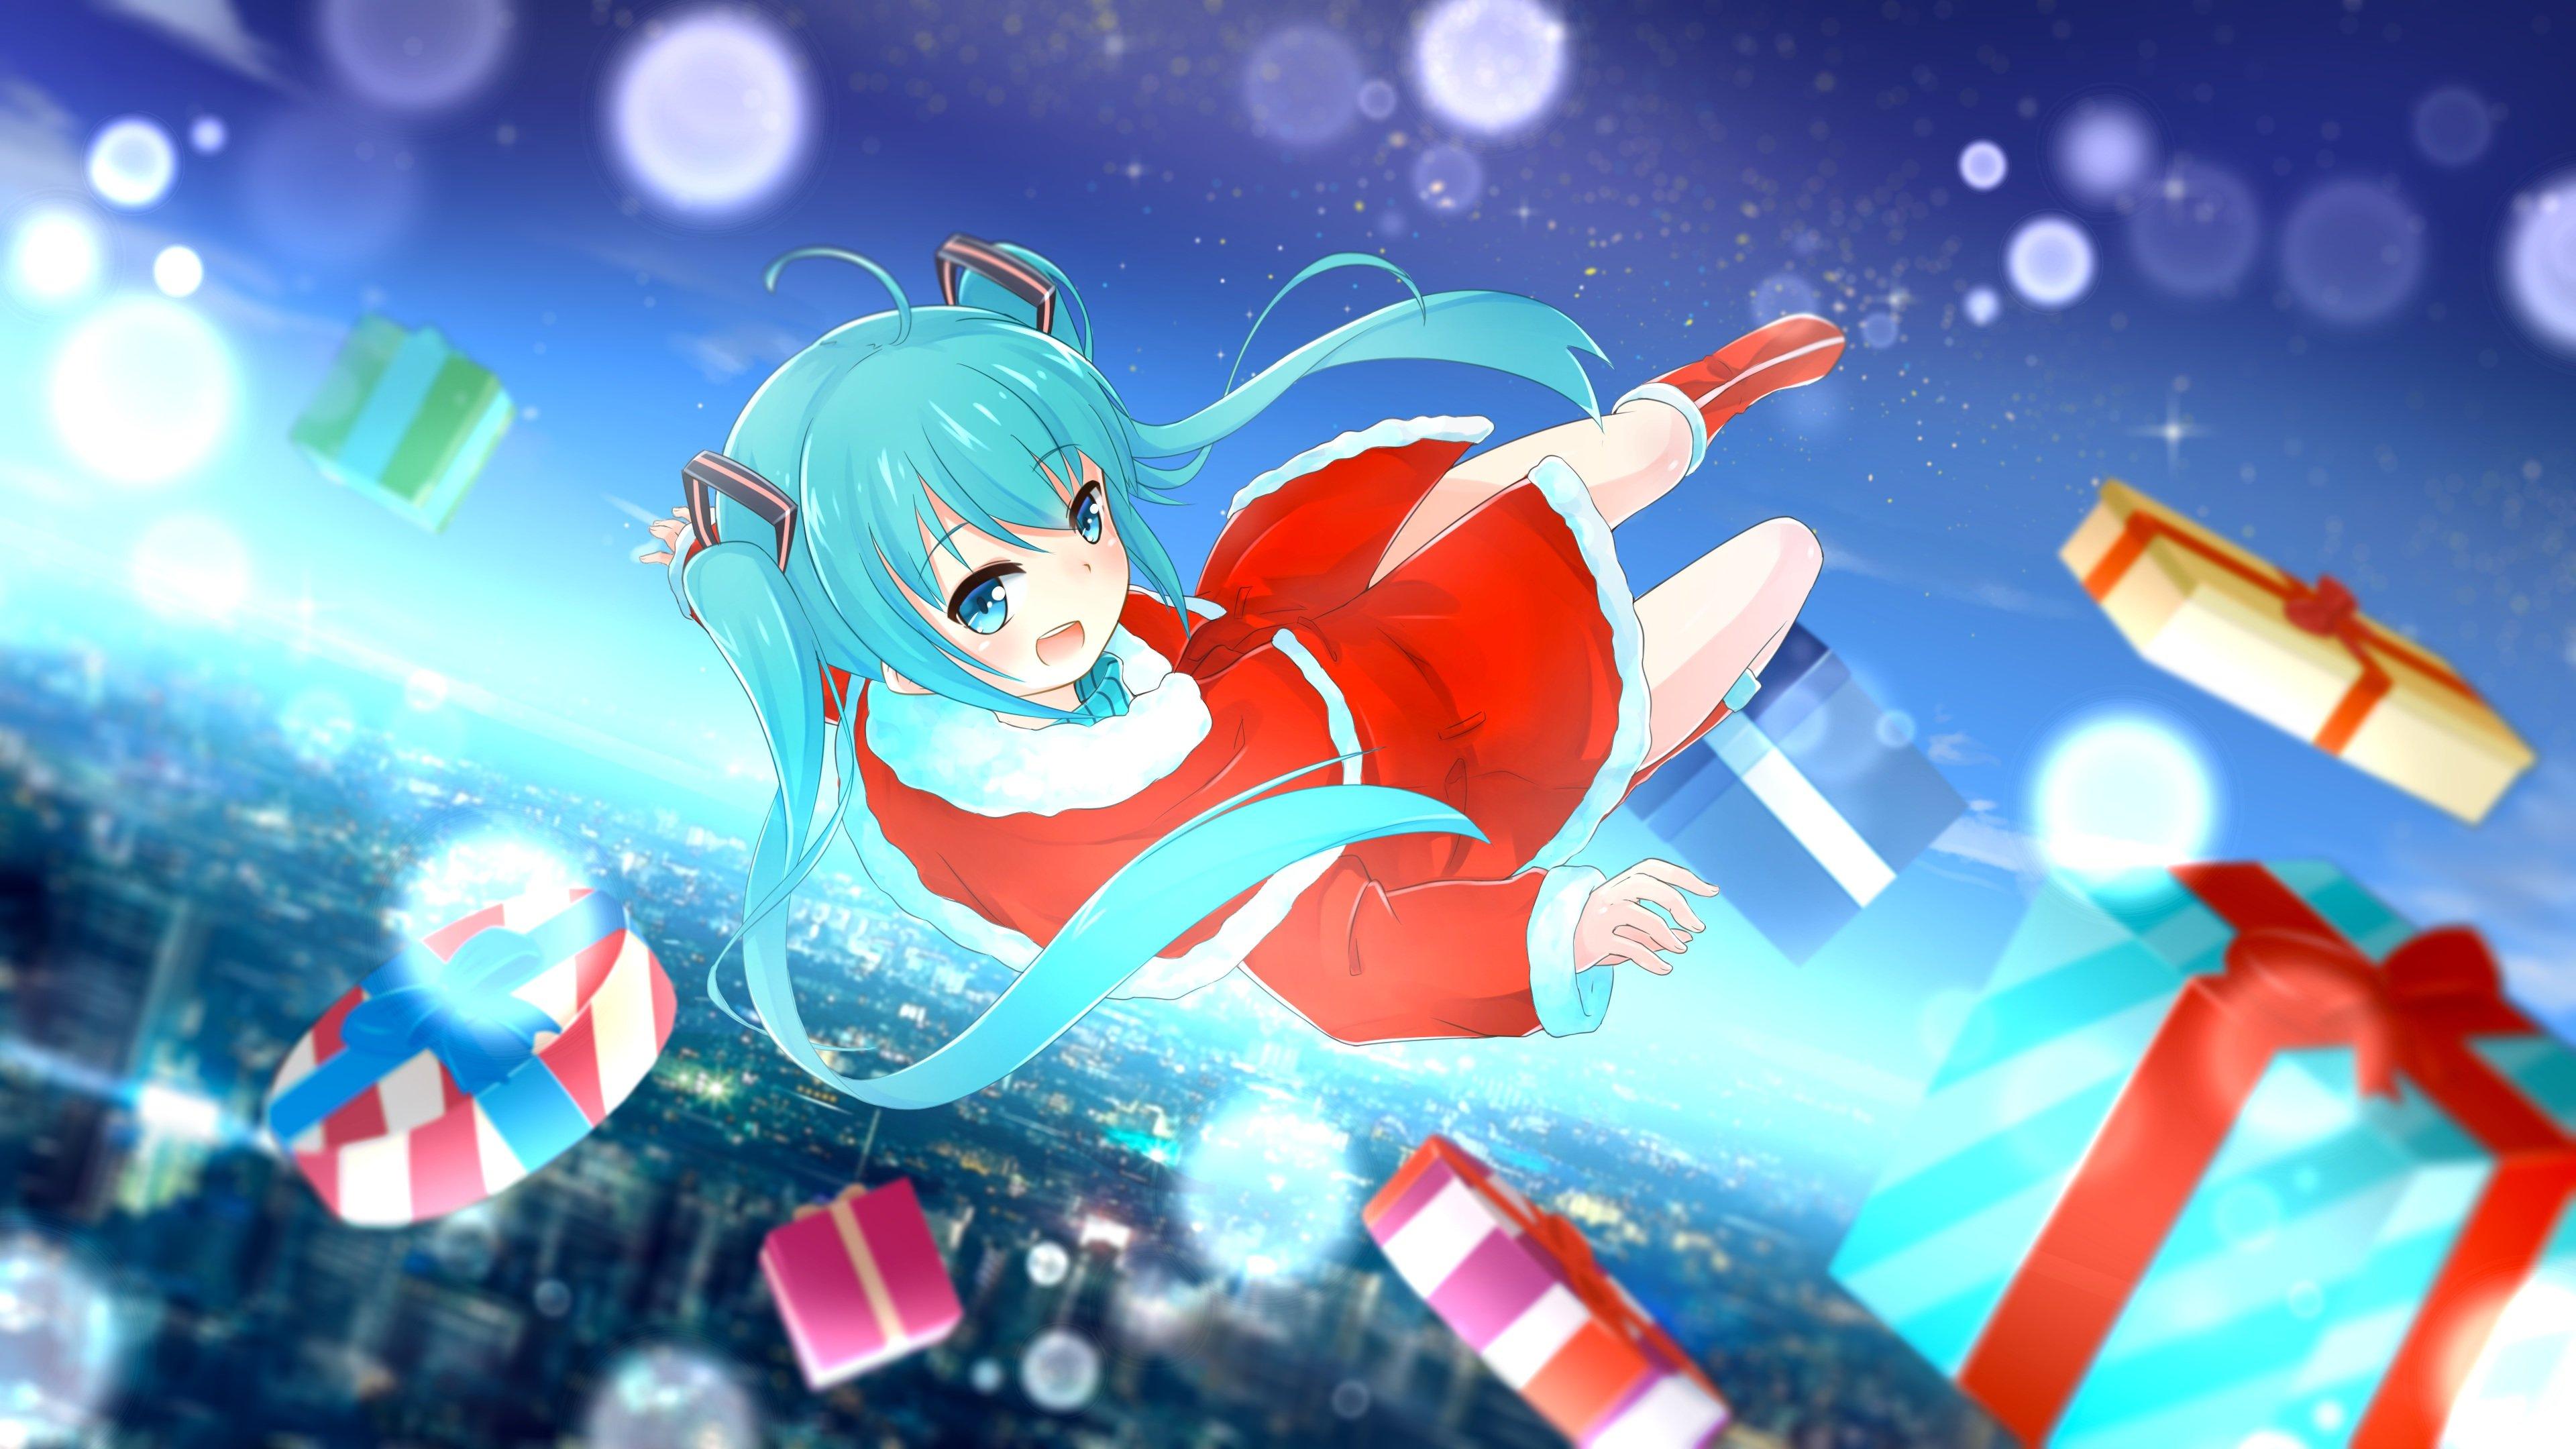 Fondos Navidad Animados: Christmas Hat Hatsune Miku Santa Costume Santa Hat